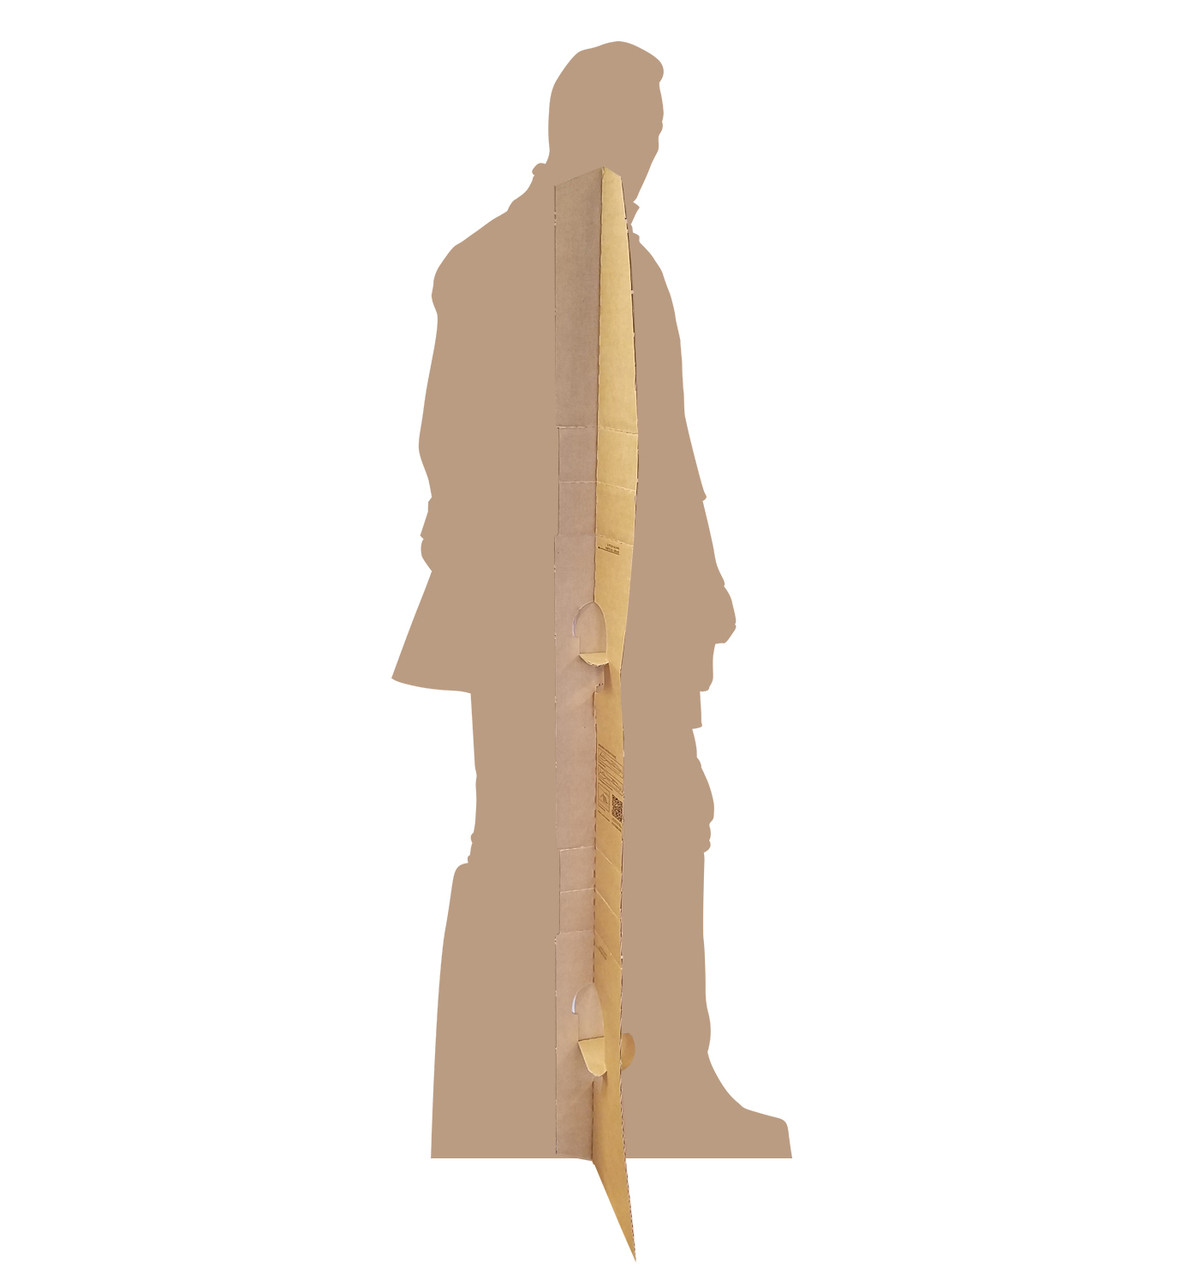 Life-size Gaston (Disney's Beauty and the Beast) Cardboard Standup | Cardboard Cutout